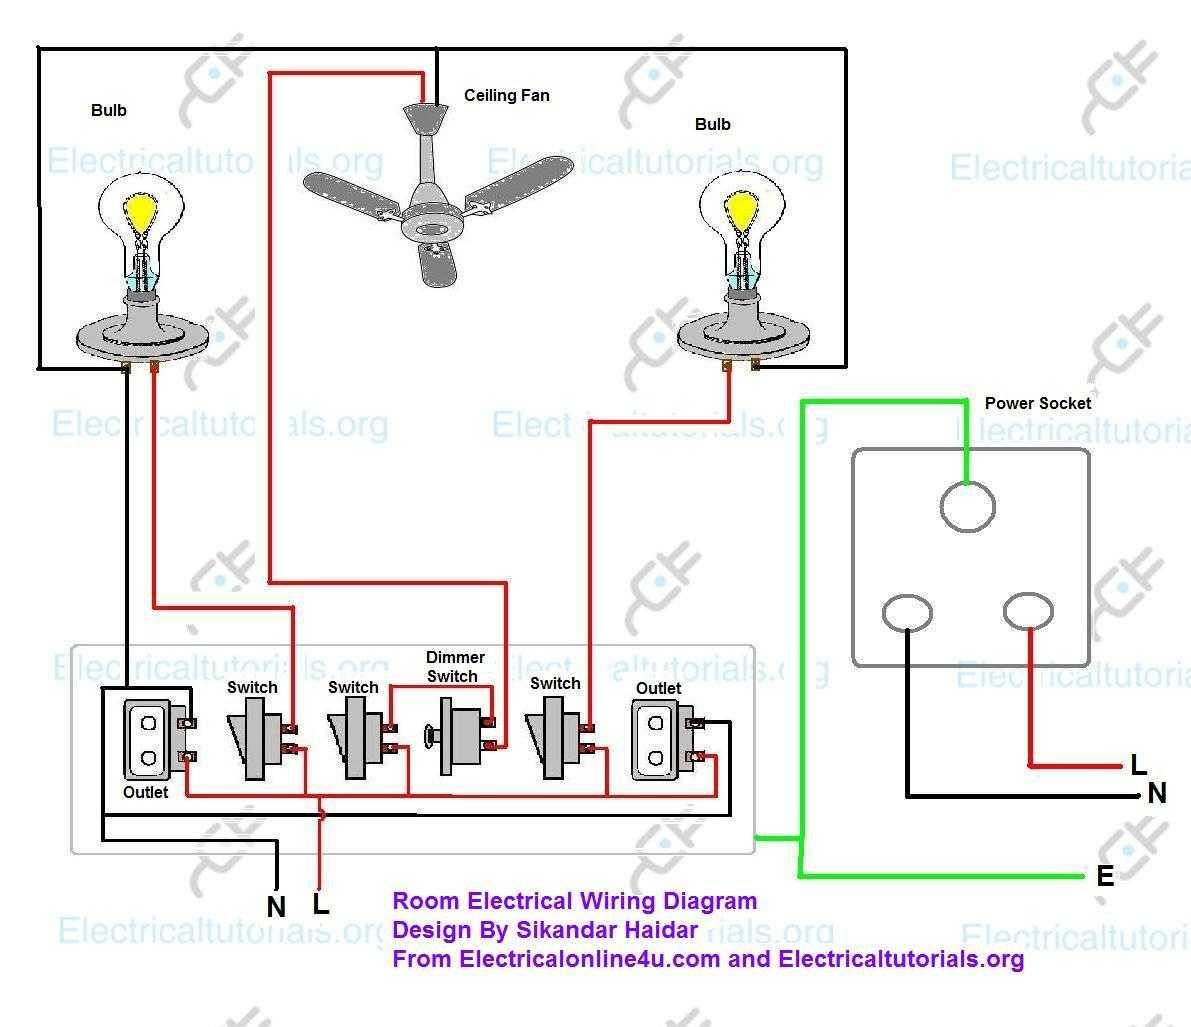 Electrical Wiring Diagram Pdf Diagrams 6   Hastalavista - Electrical Wiring Diagram Pdf